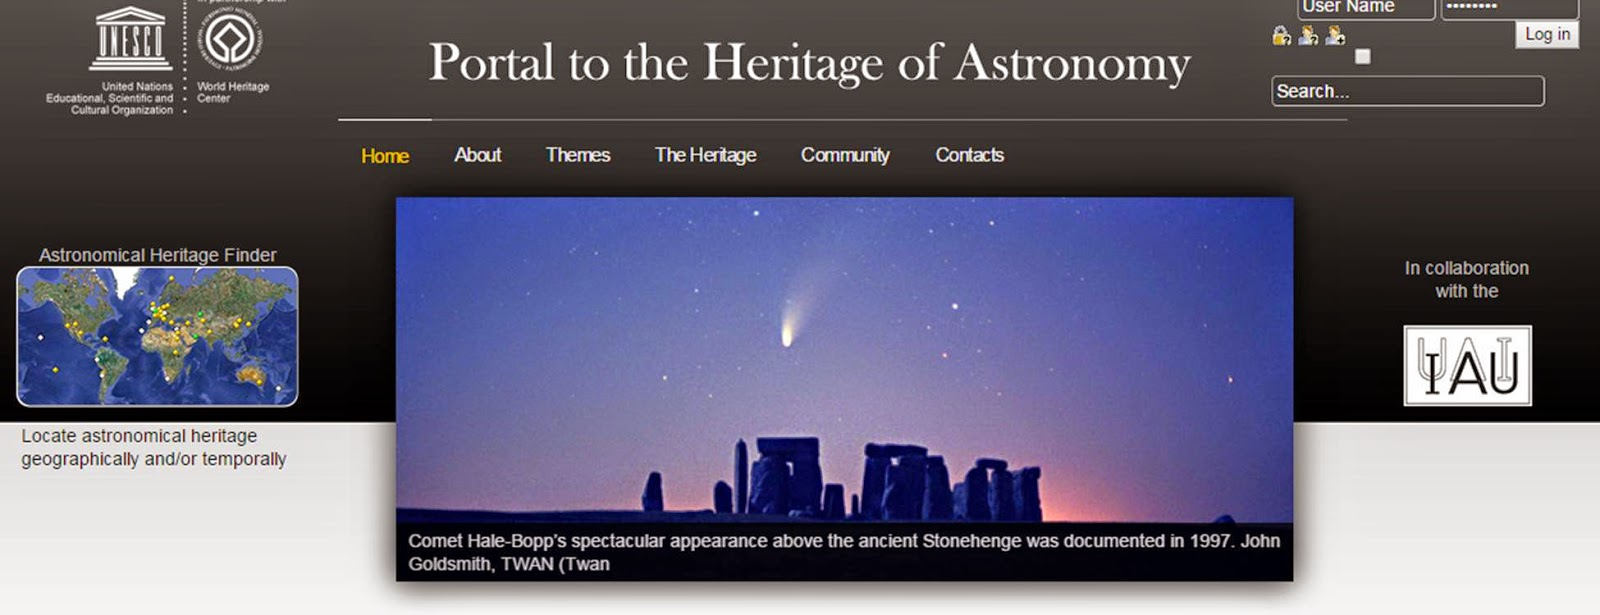 UNESCO World Heritage Portal to the Heritage of Astronomy